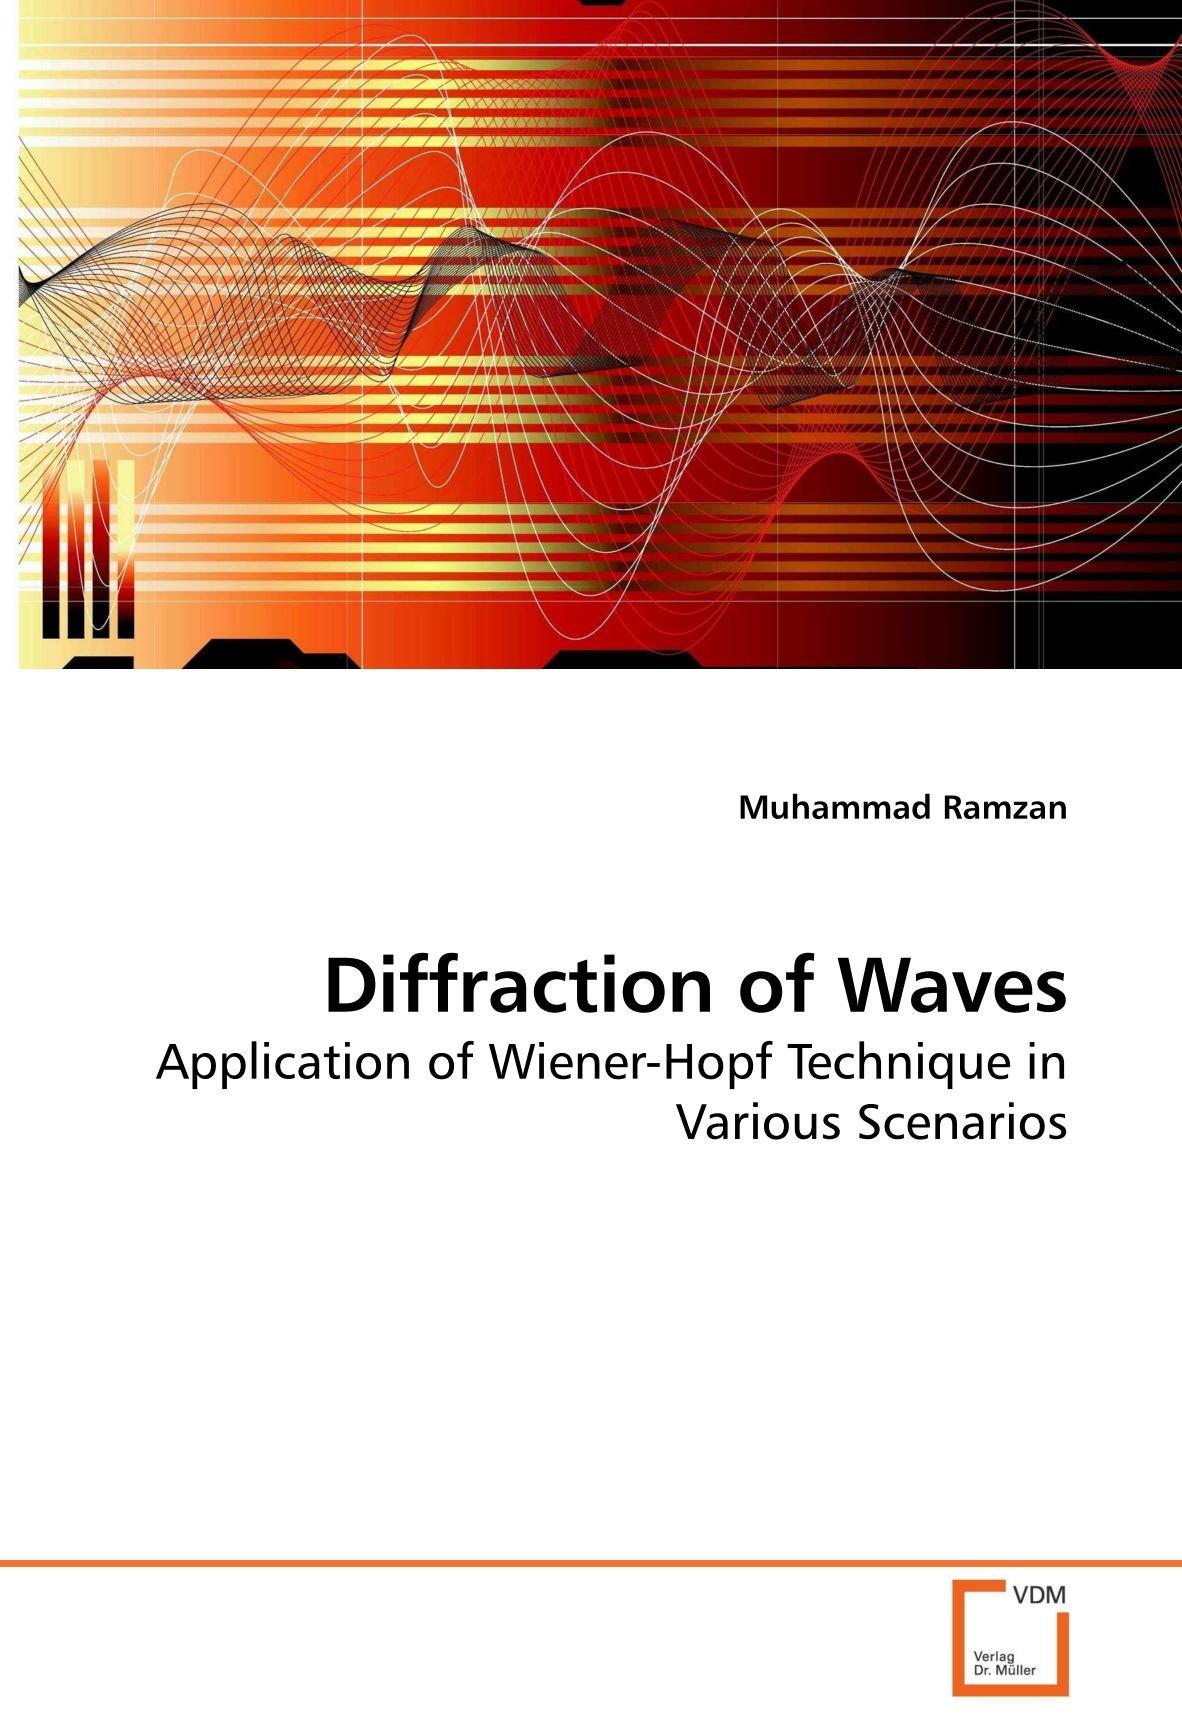 Diffraction of Waves: Application of Wiener-Hopf Technique in Various Scenarios pdf